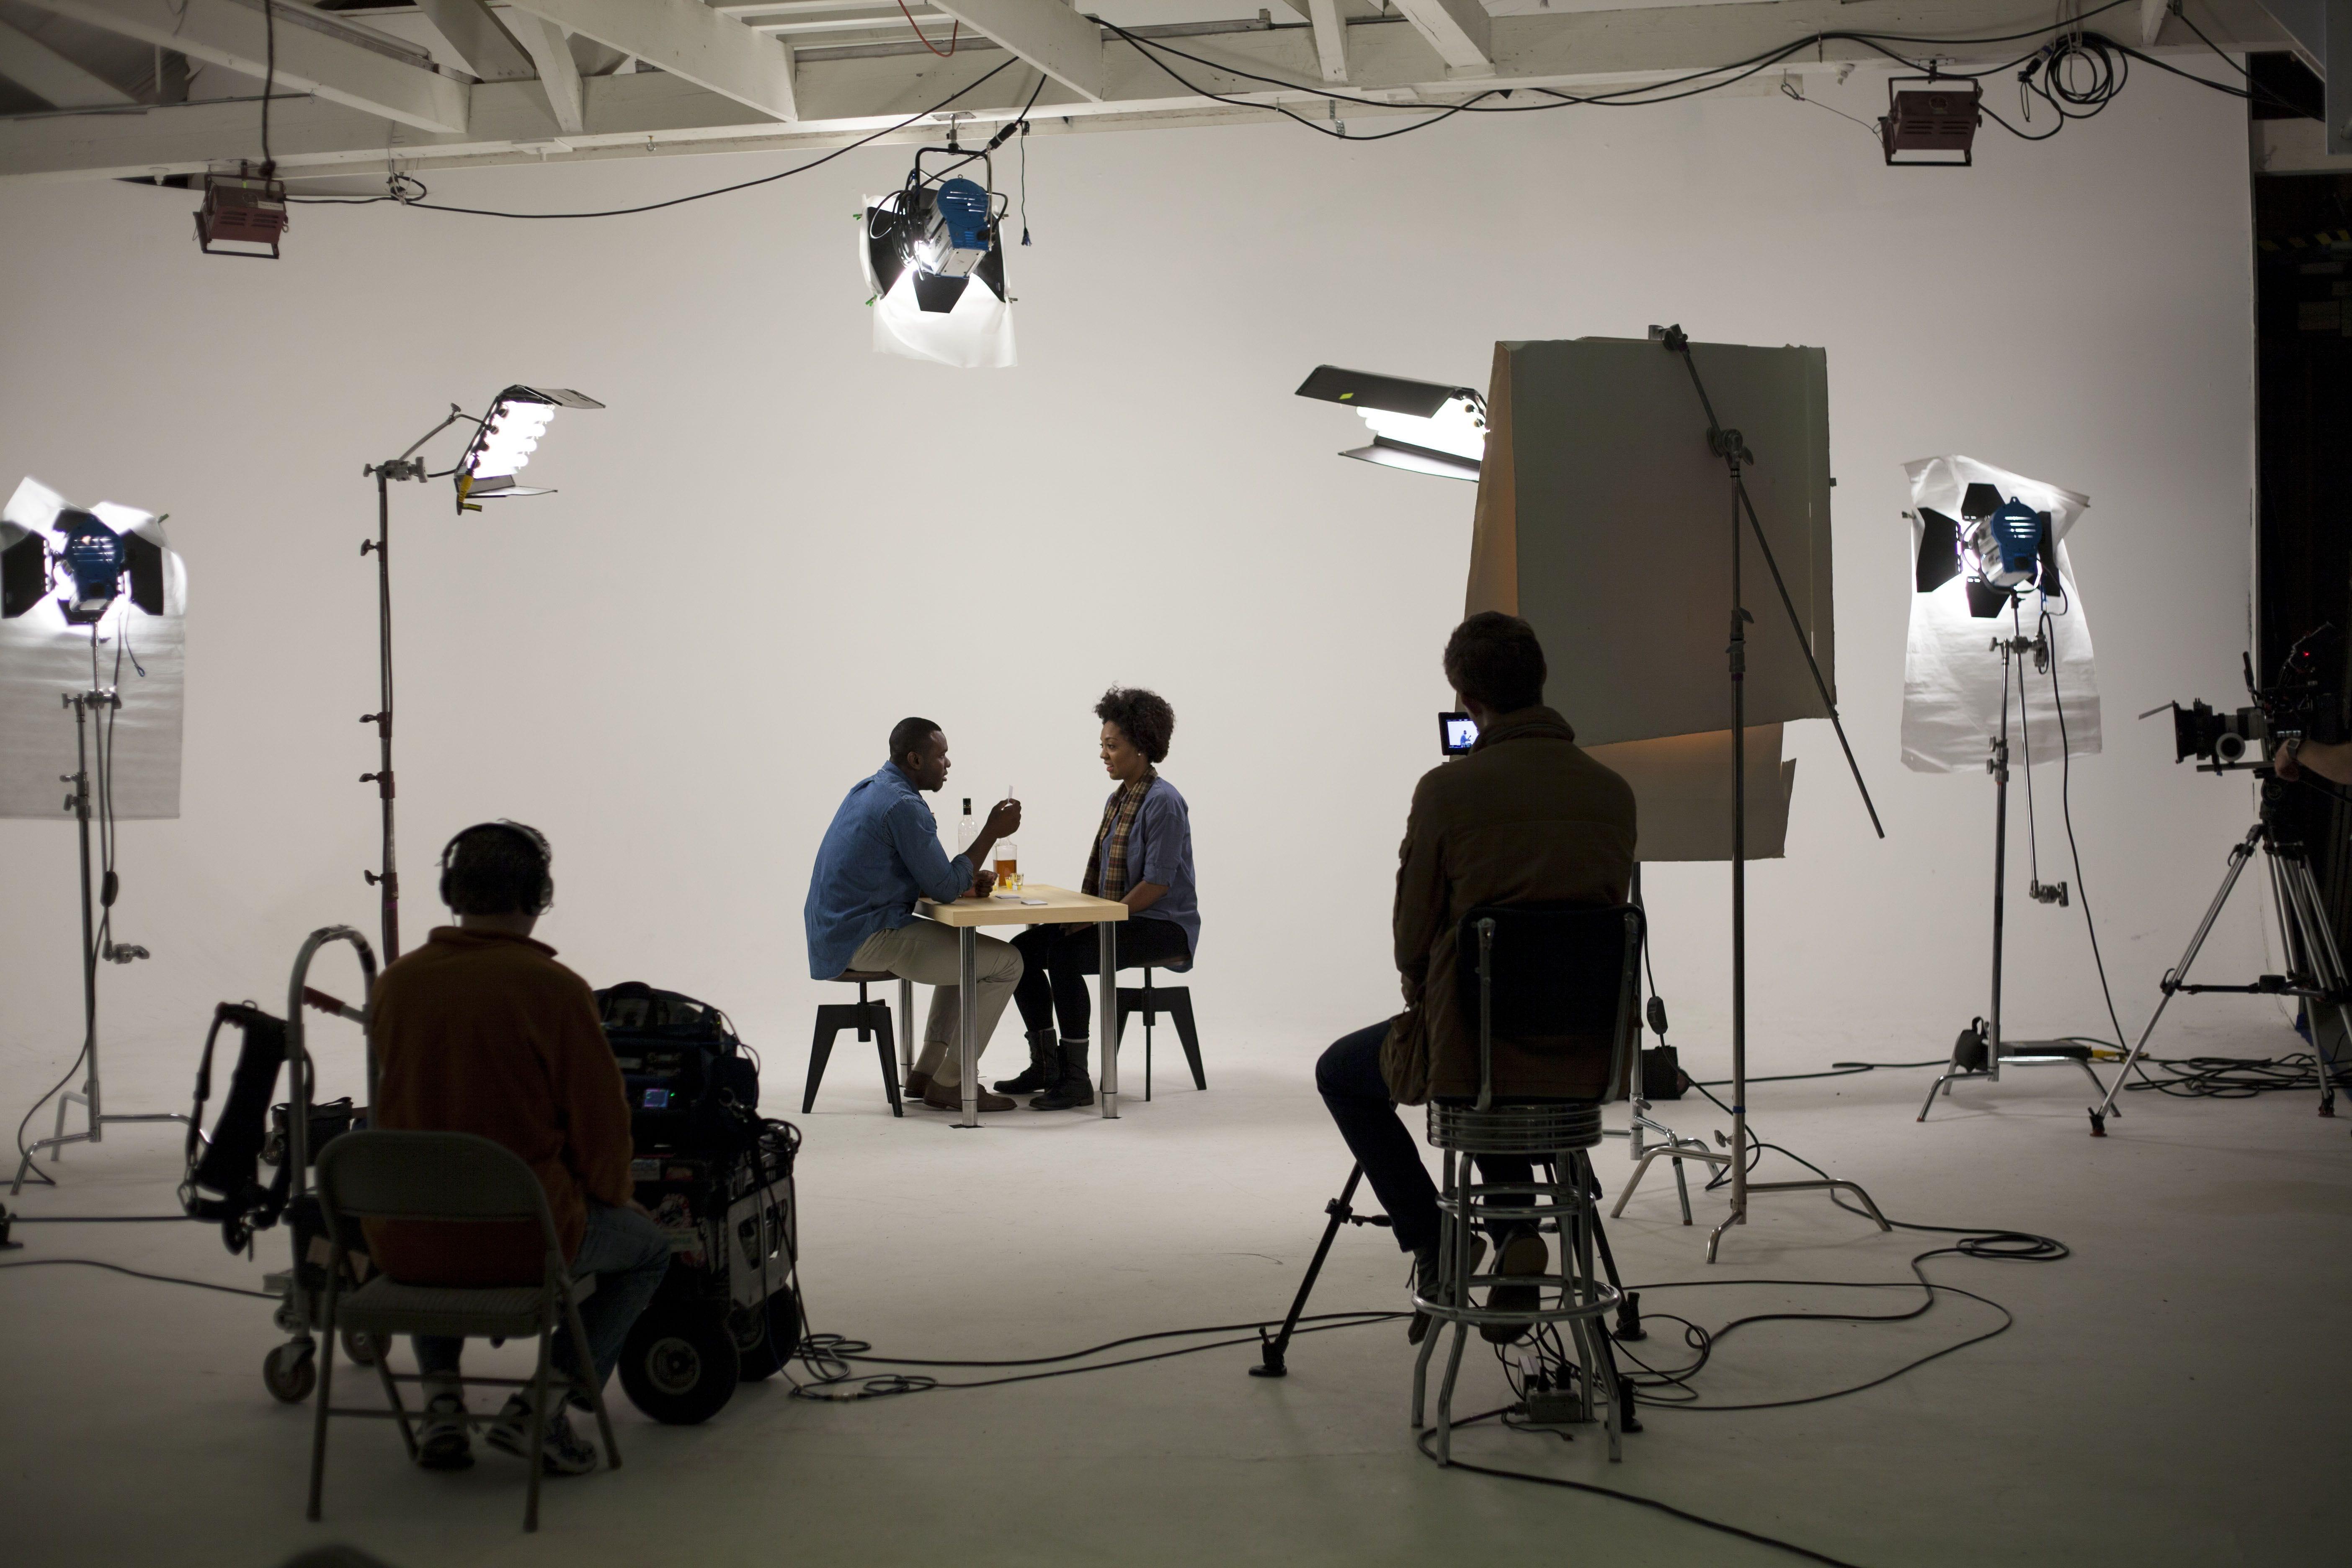 Crew filming video